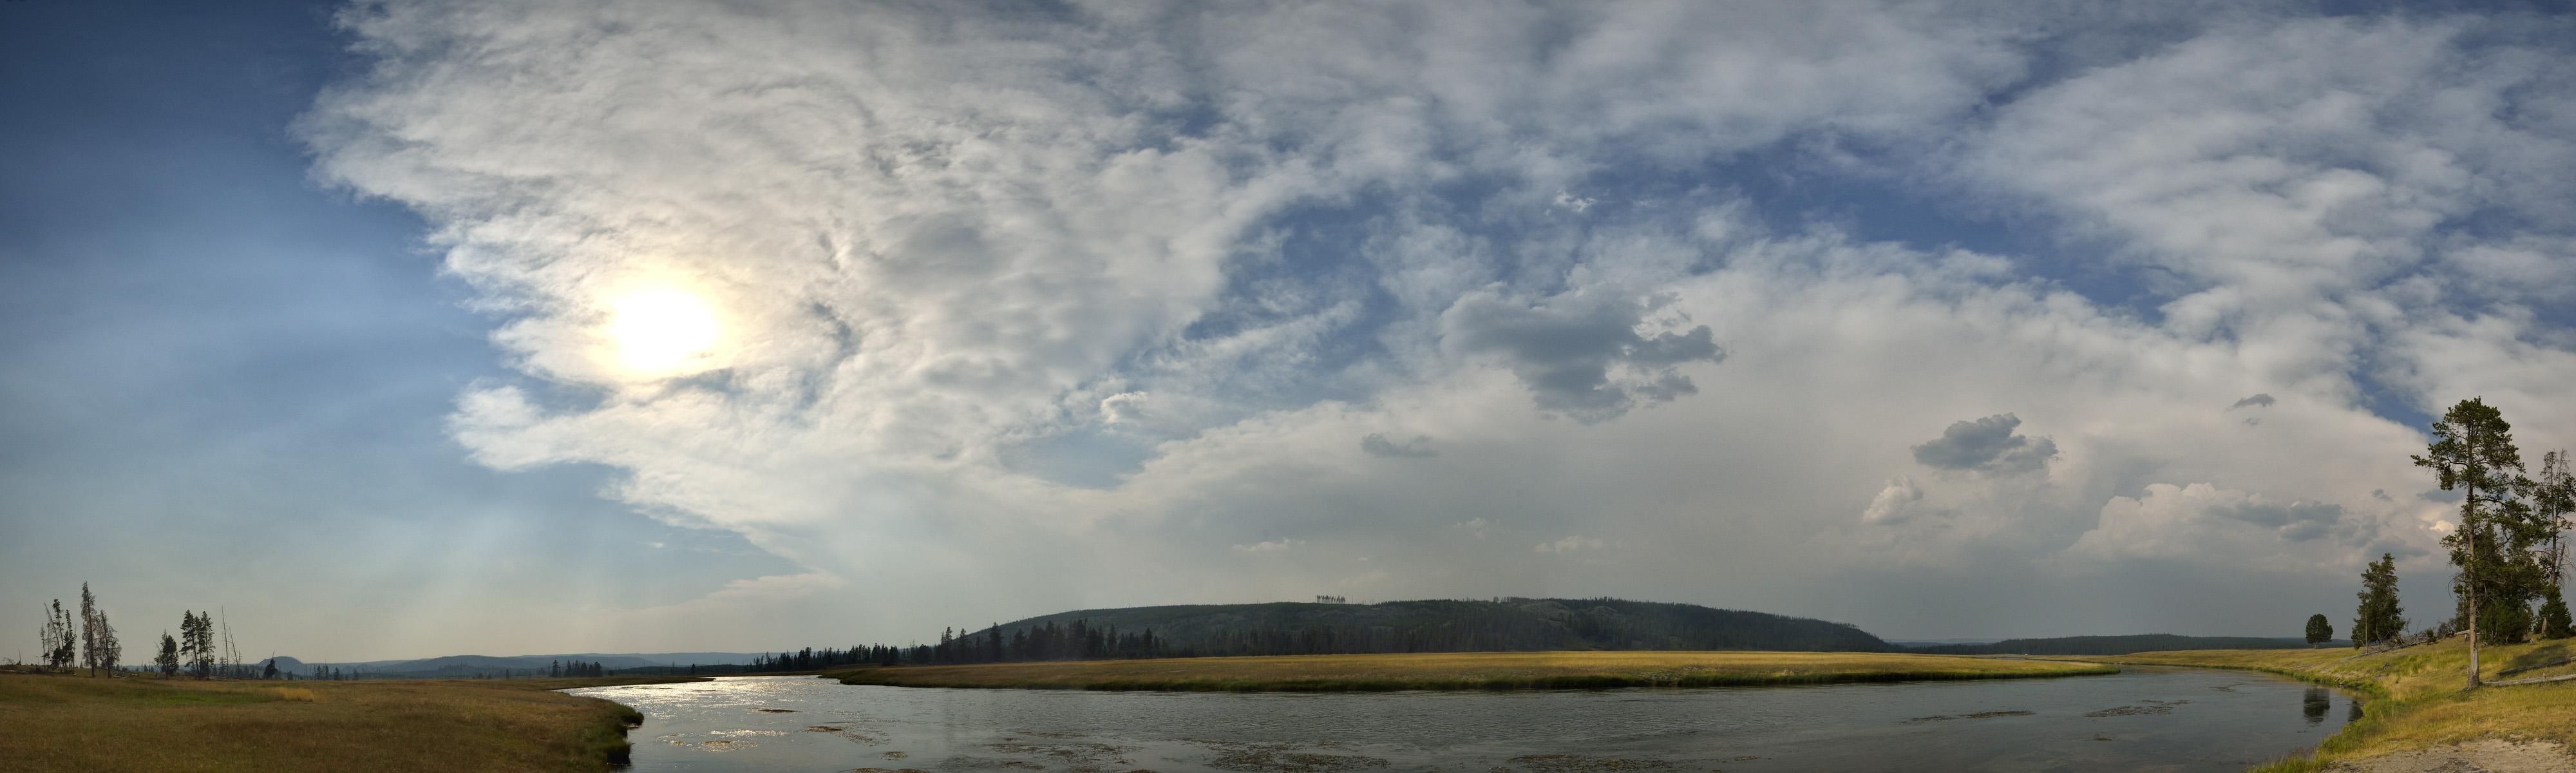 Sentenial Creek Meadows